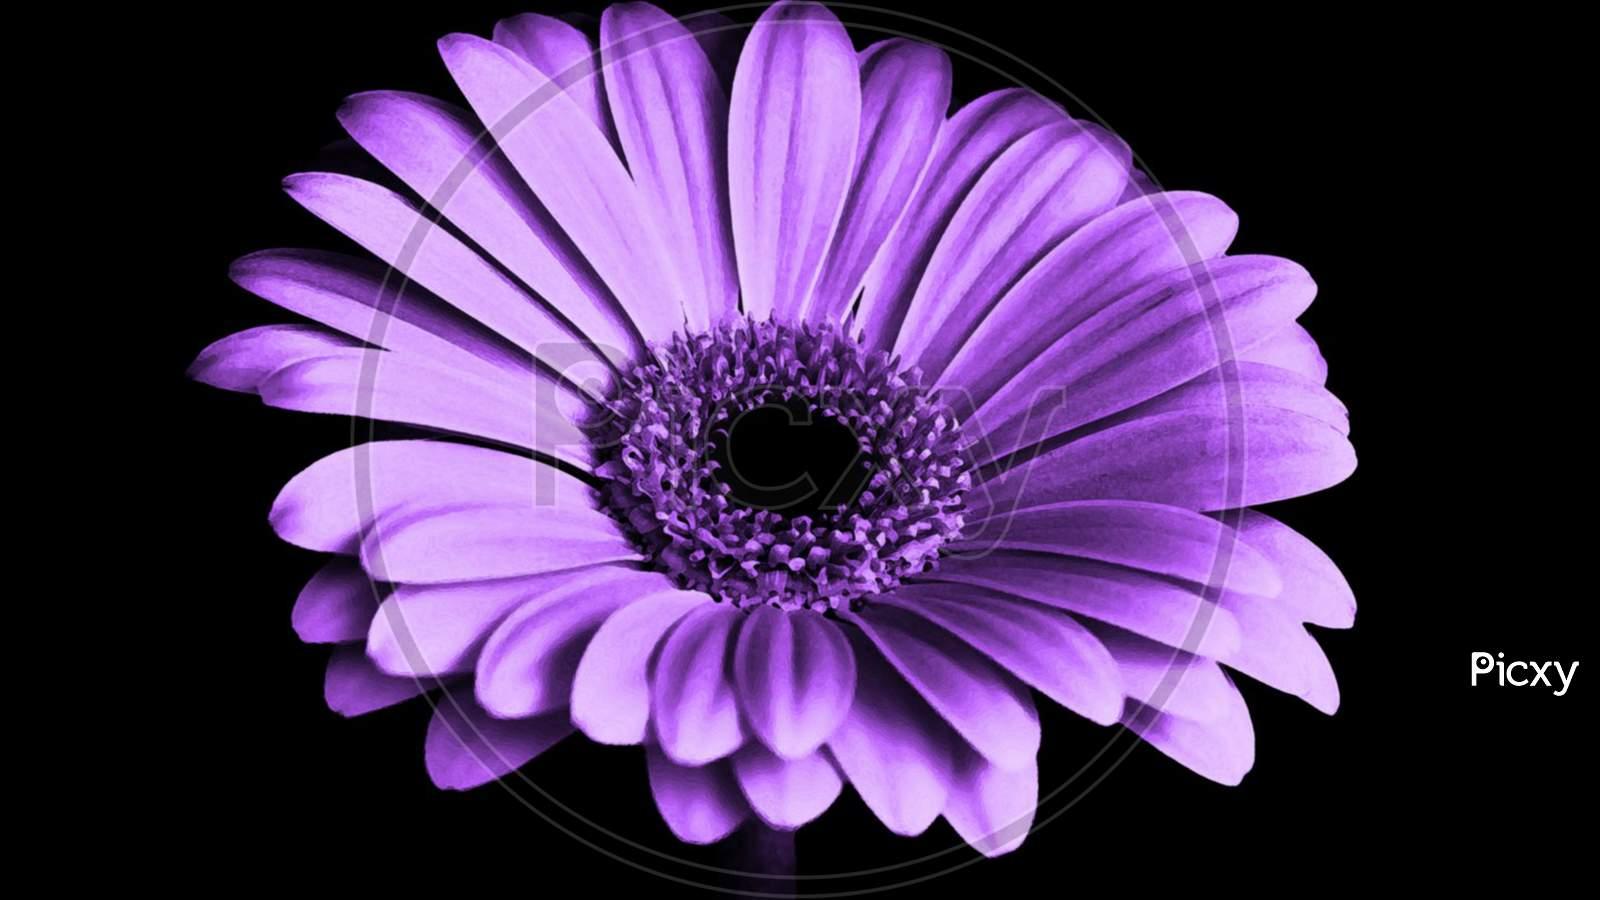 Image Of Nice Flower Purple Flower Ot155148 Picxy